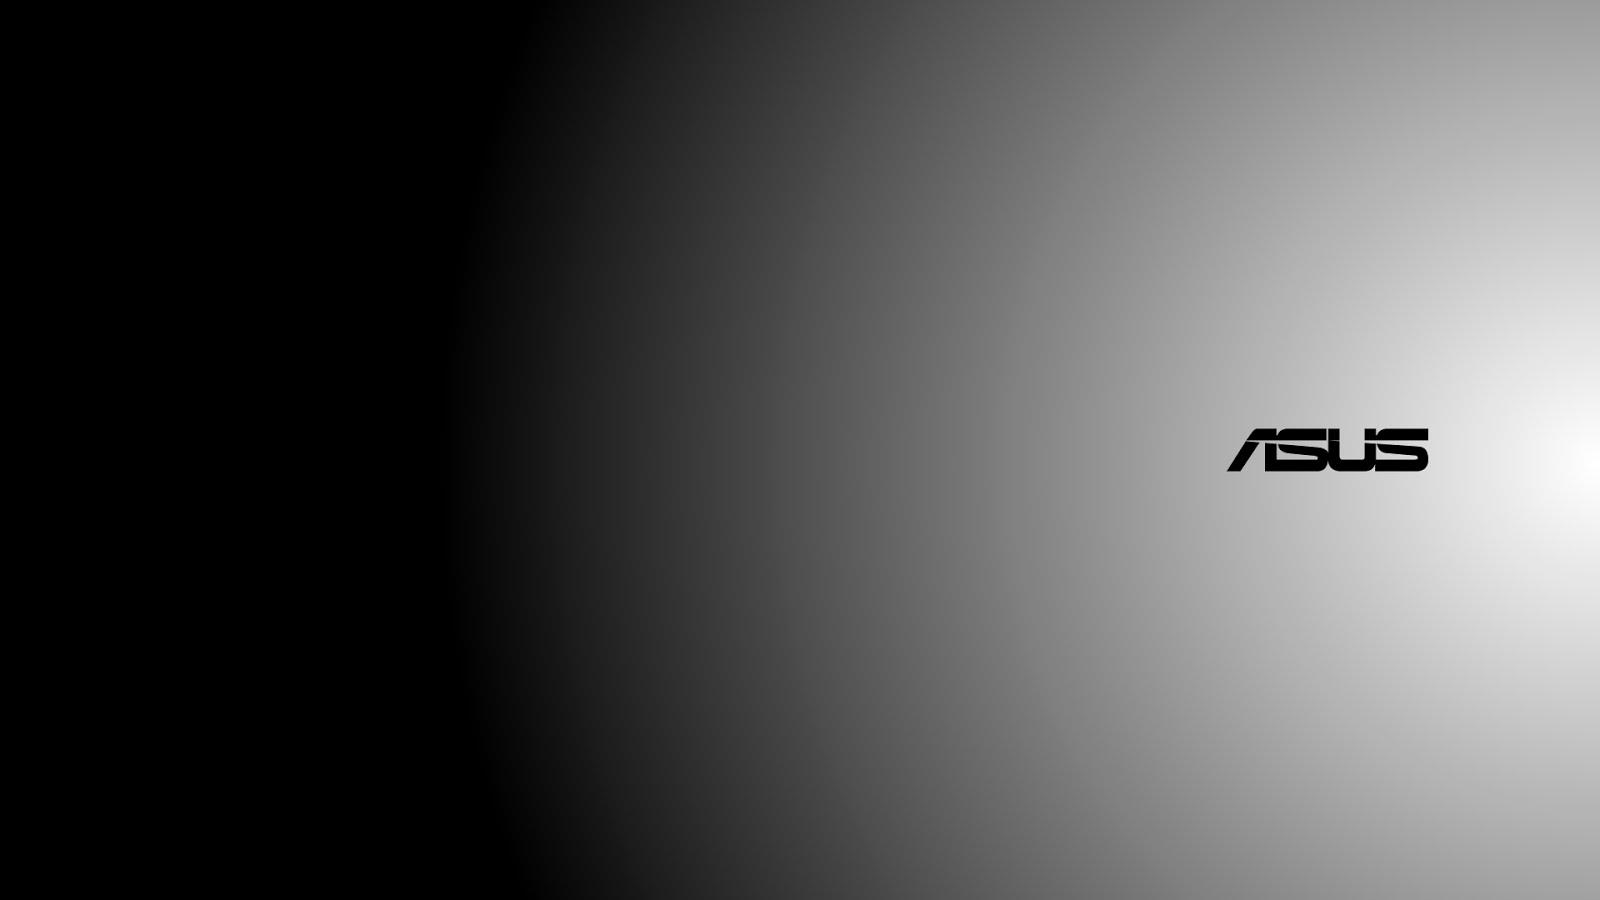 Asus Black Wallpaper: Sairanto Yana Damanik Wallpaper Laptop Acer Keren